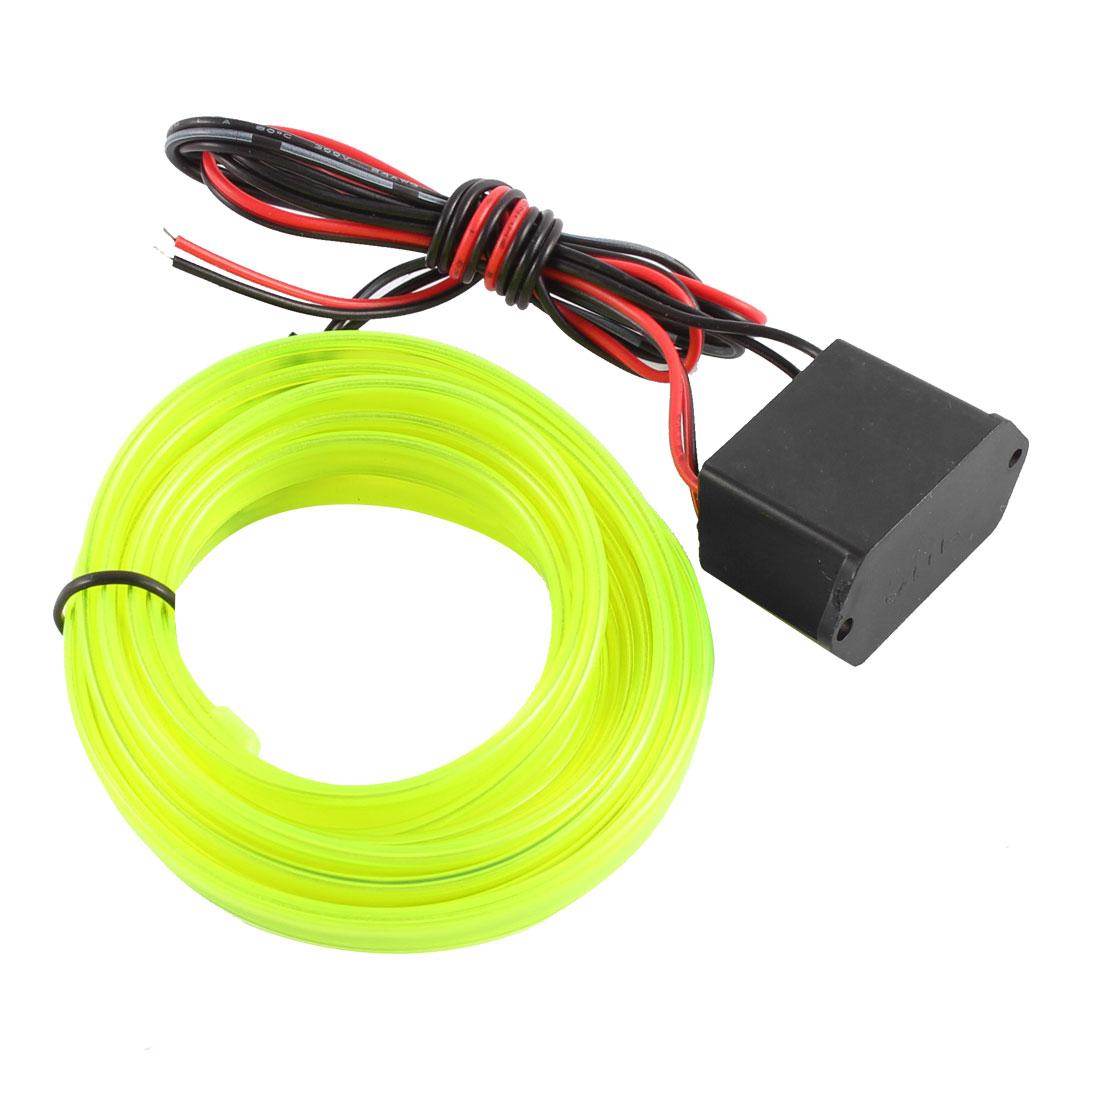 2M Long Flexible EL Wire Neon Light Dance Car Decor Yellow DC 12V